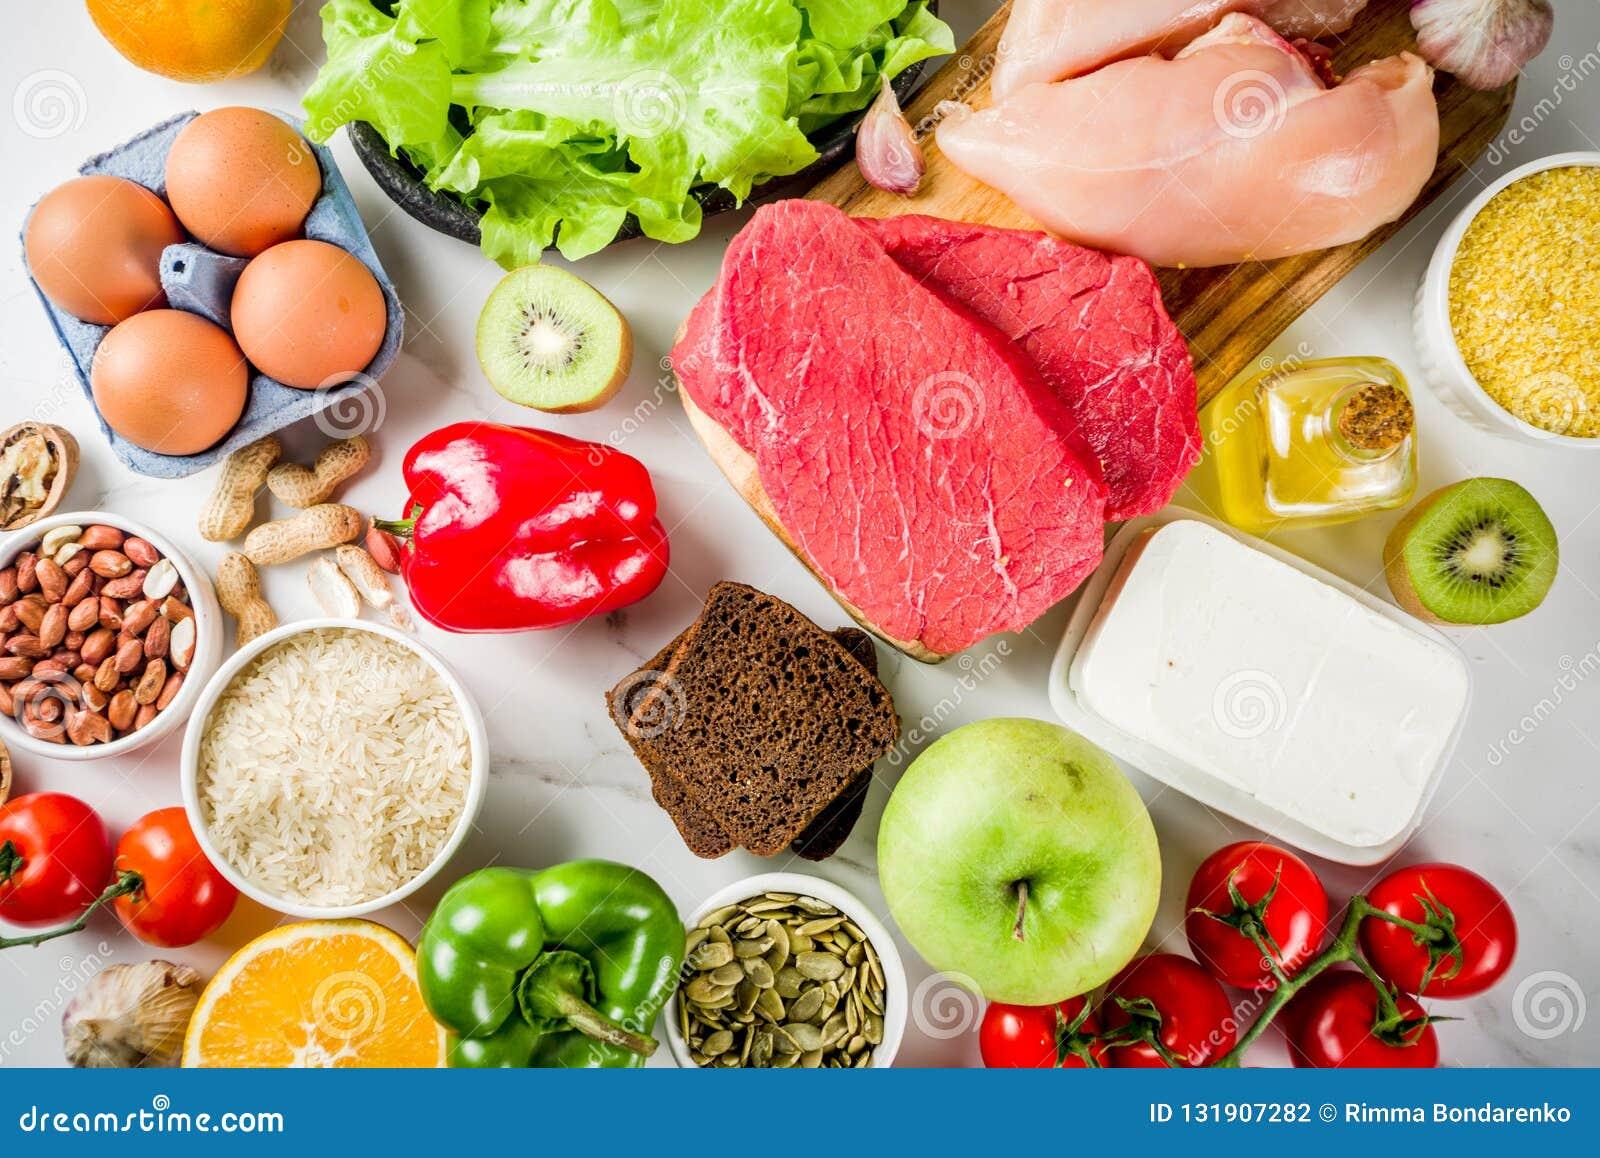 Alimentos para dieta saudavel